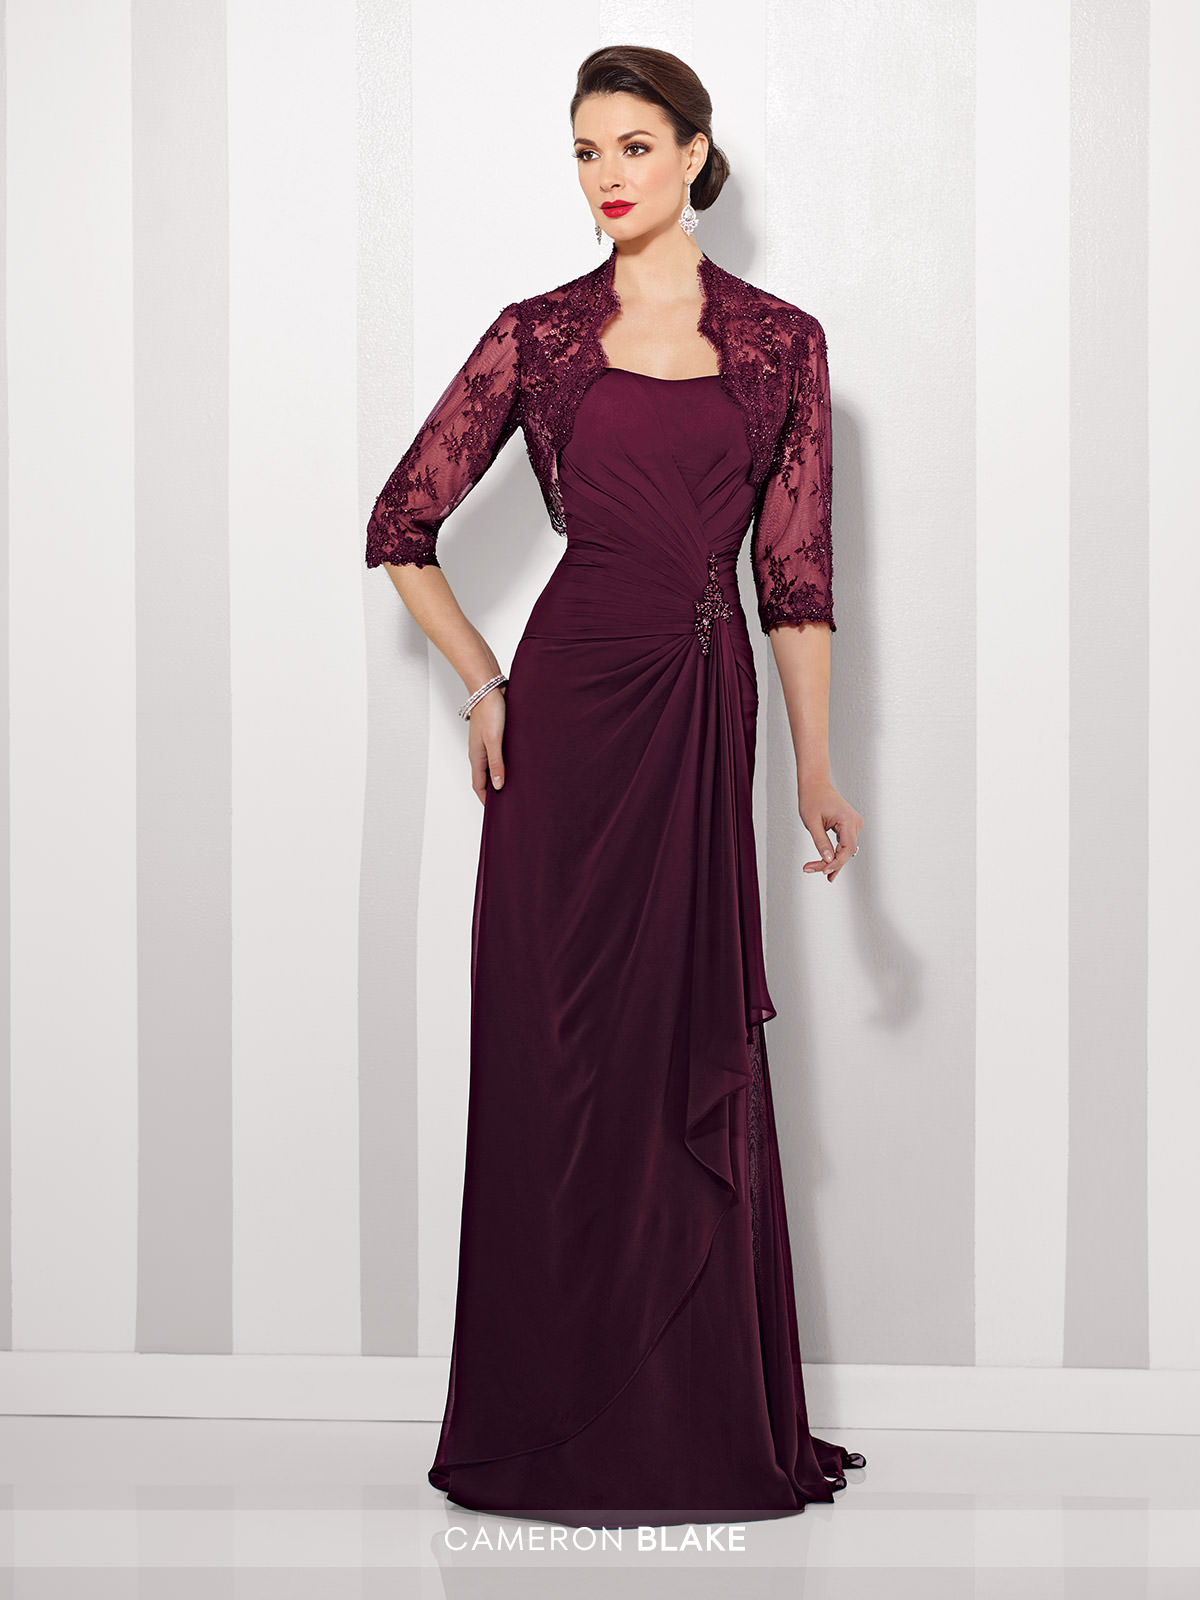 f5210cfaca Cameron Blake 216692 - Shop Marlene s Dress Shop in Collingswood